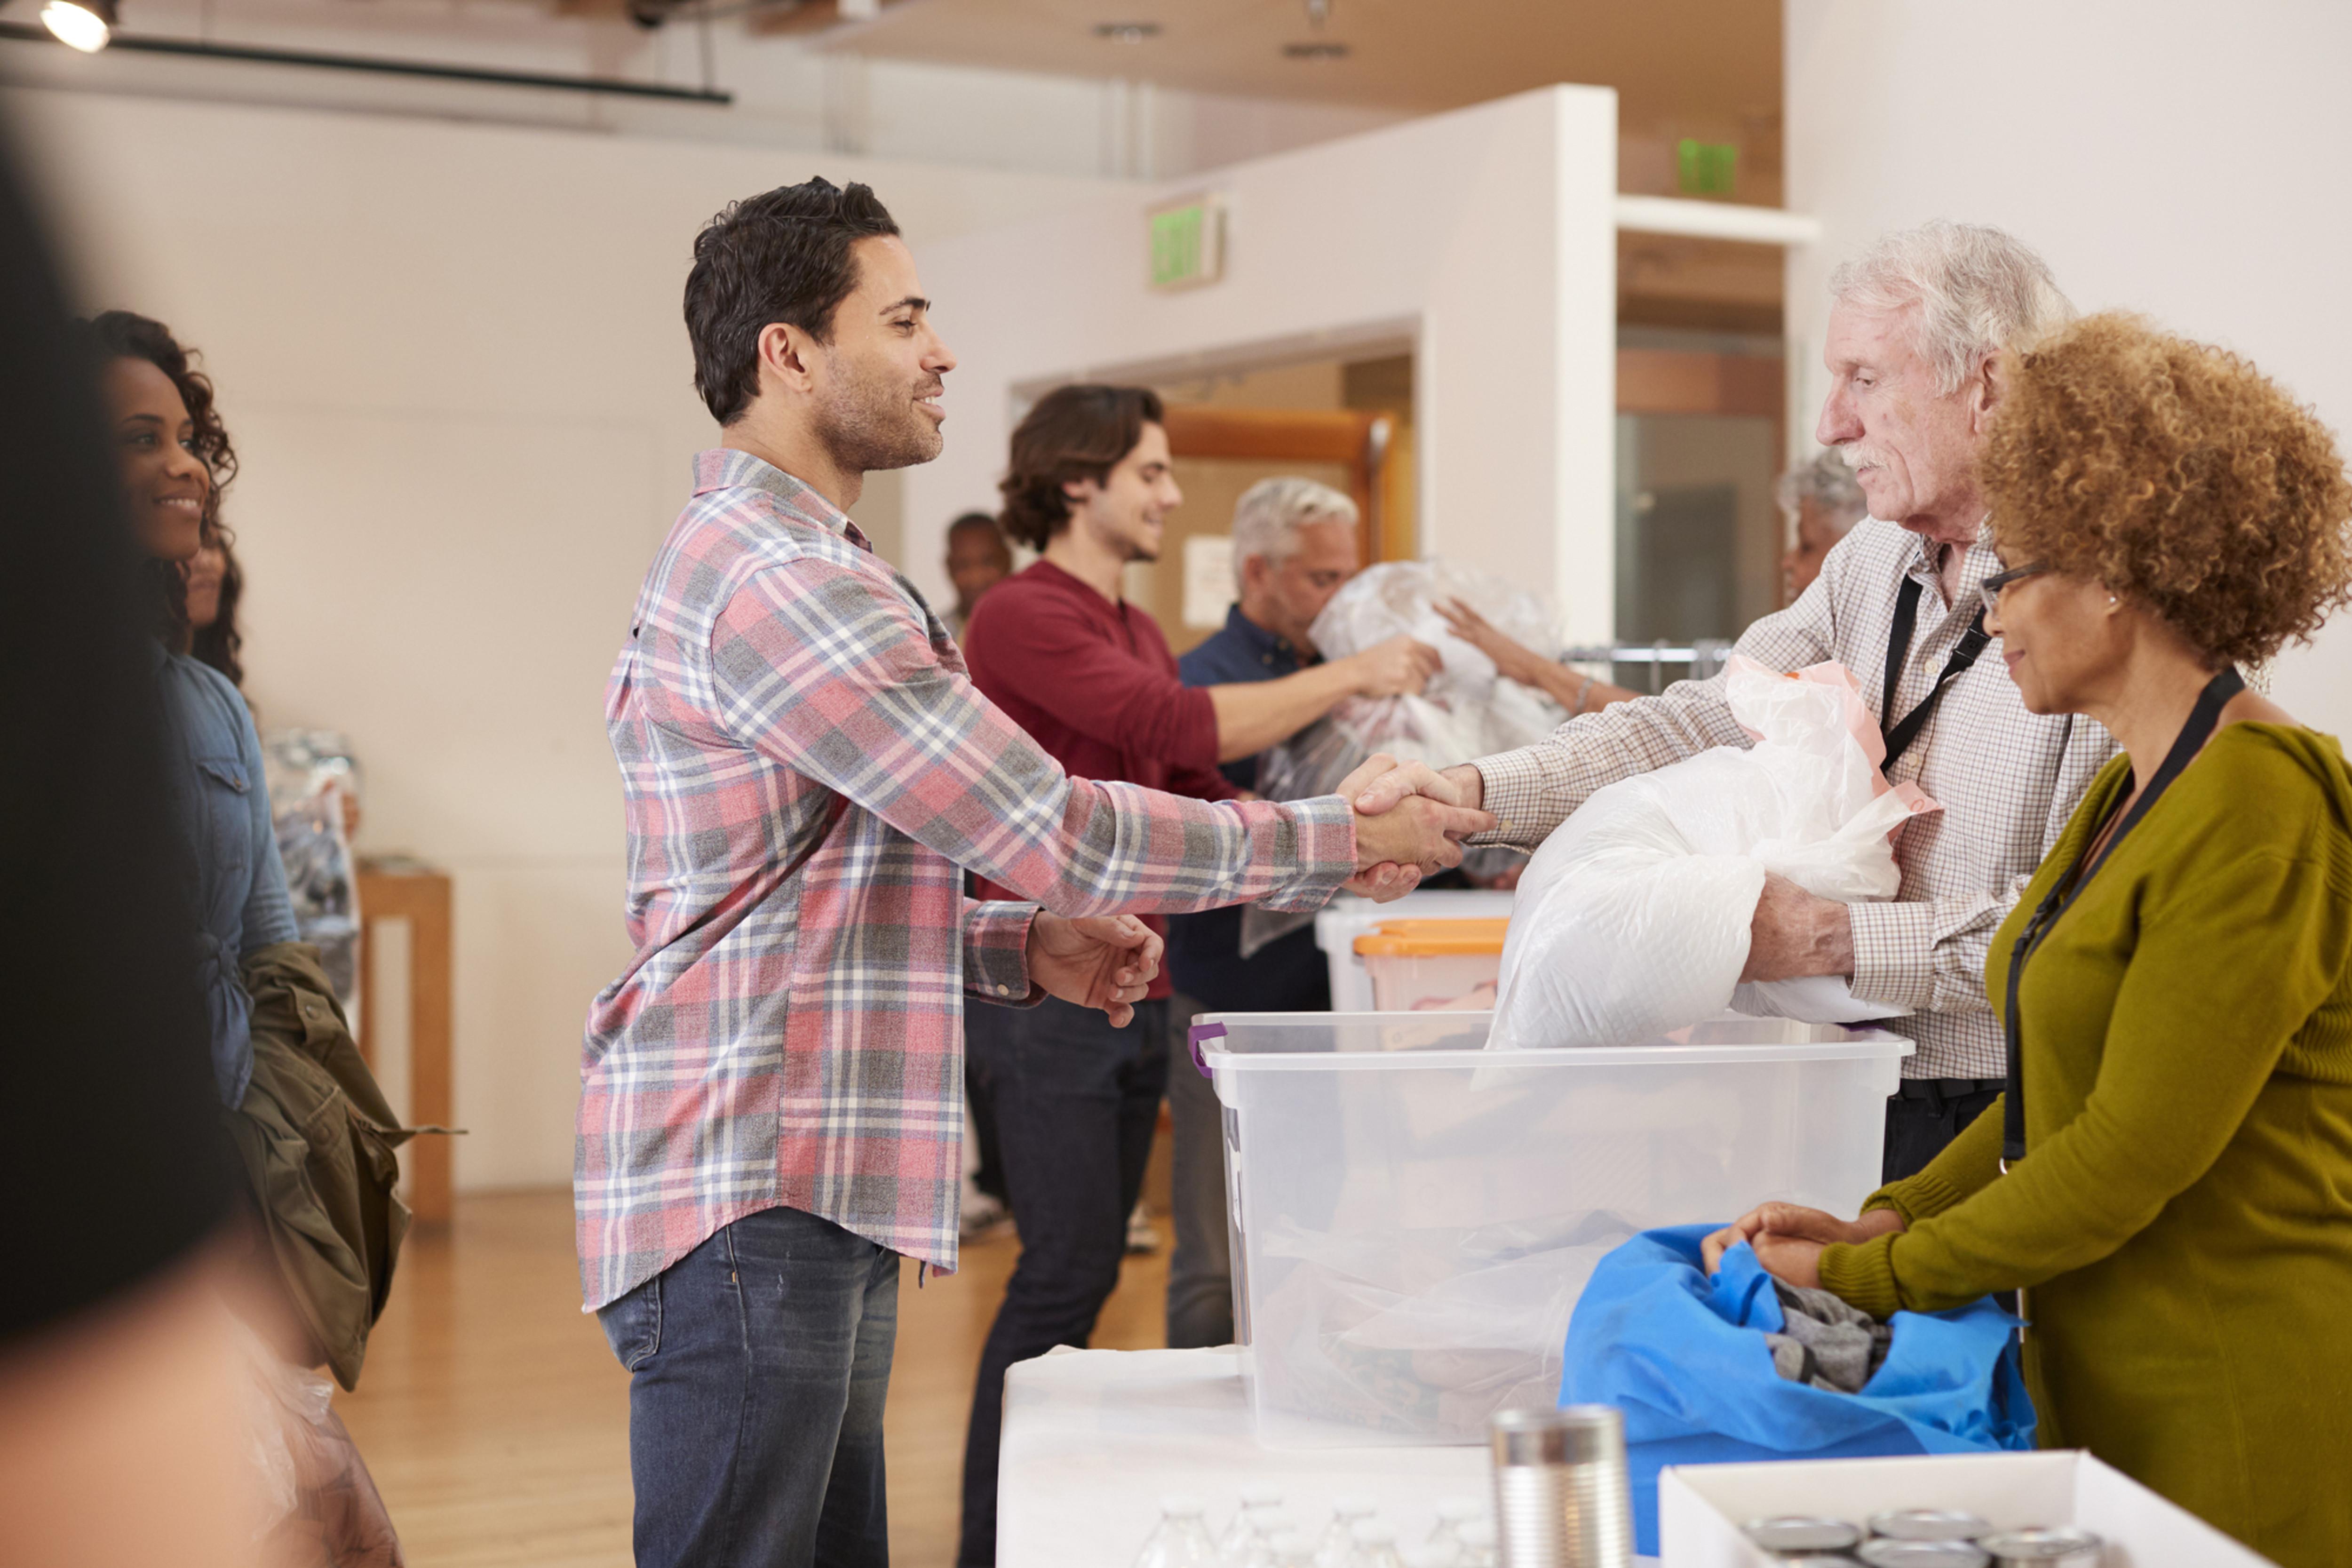 Volunteer for Donation Center